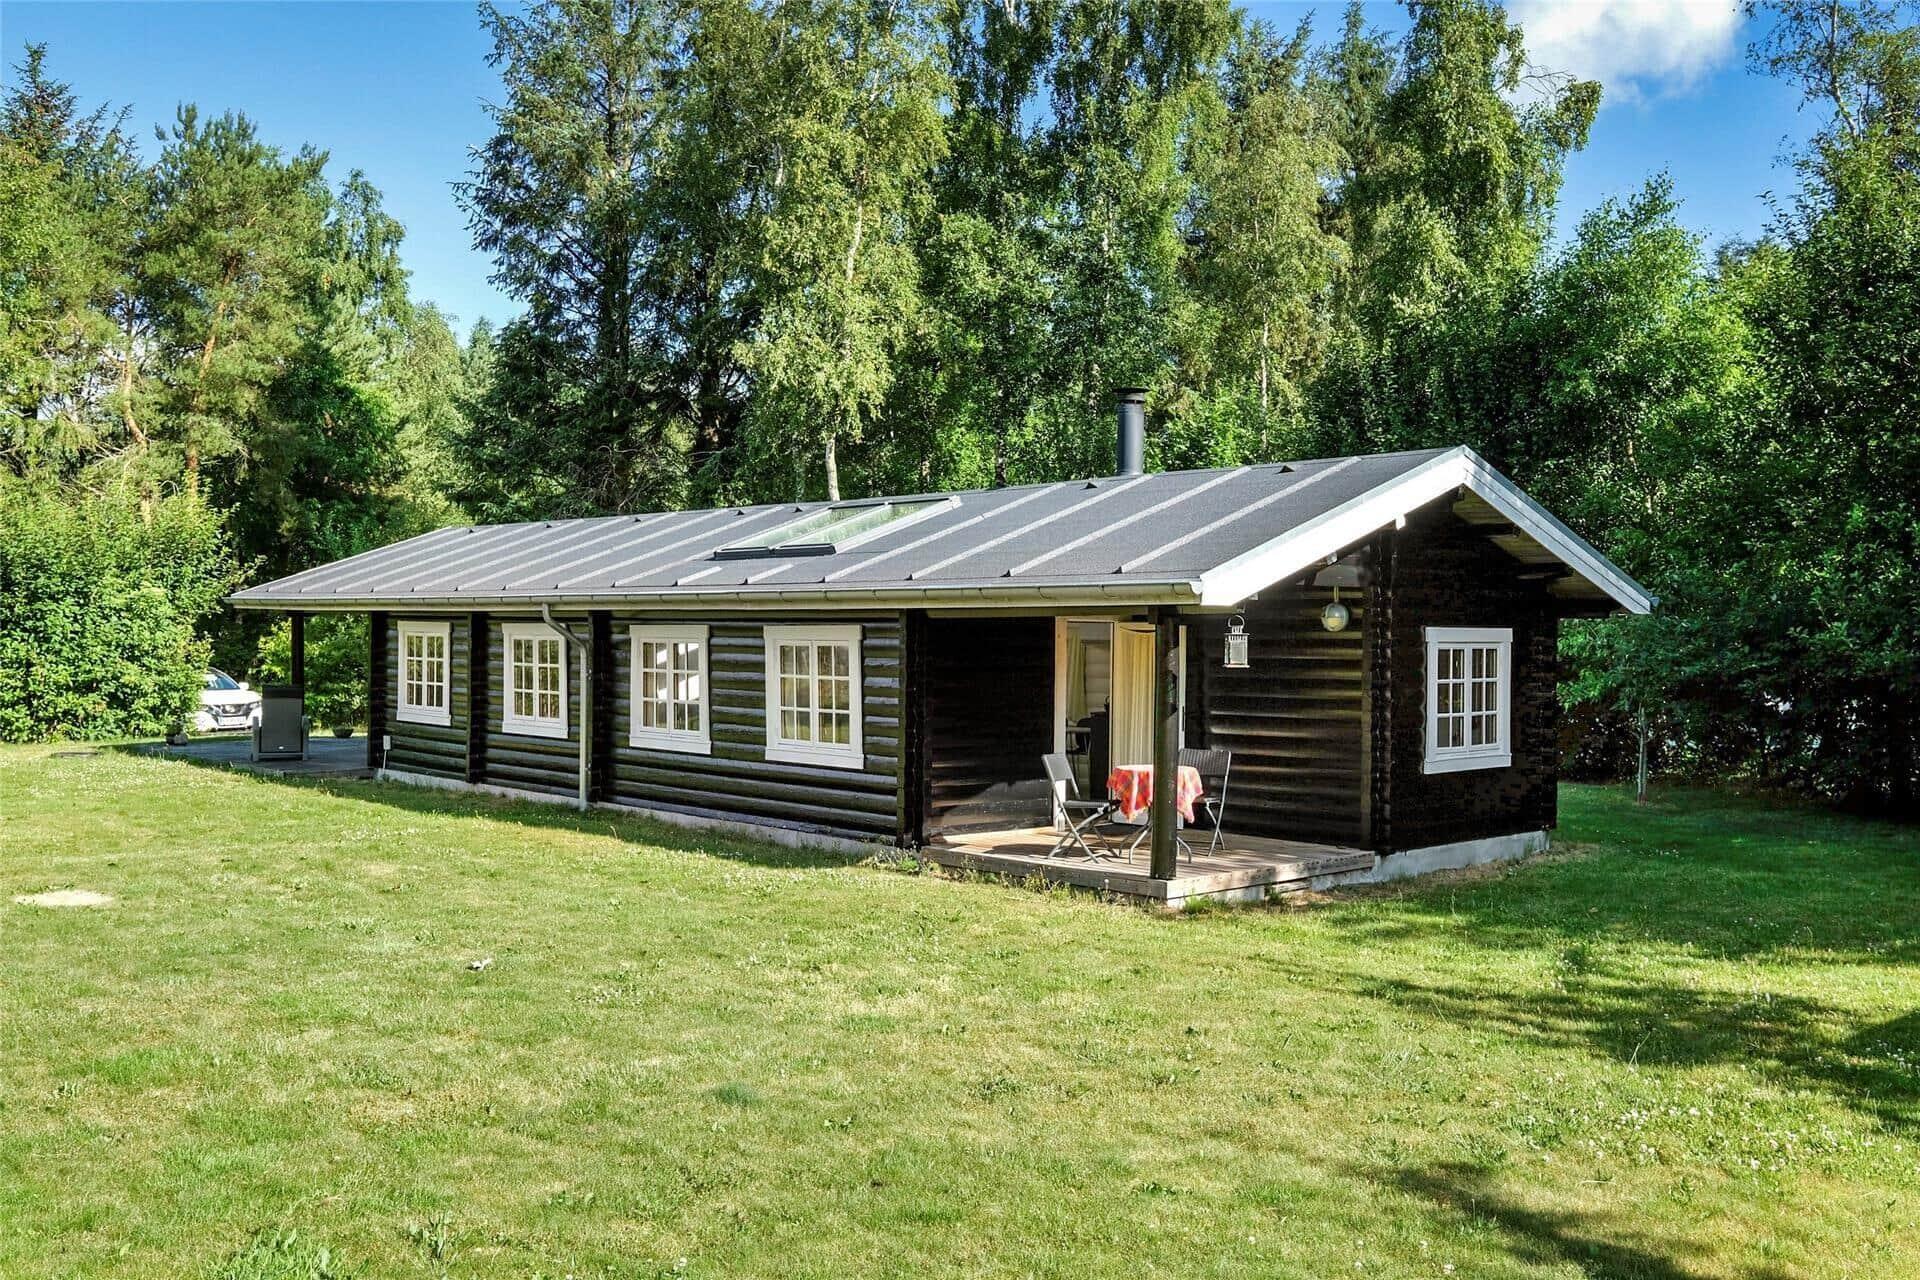 Billede 1-3 Sommerhus L16154, Ramshule 54, DK - 9640 Farsø